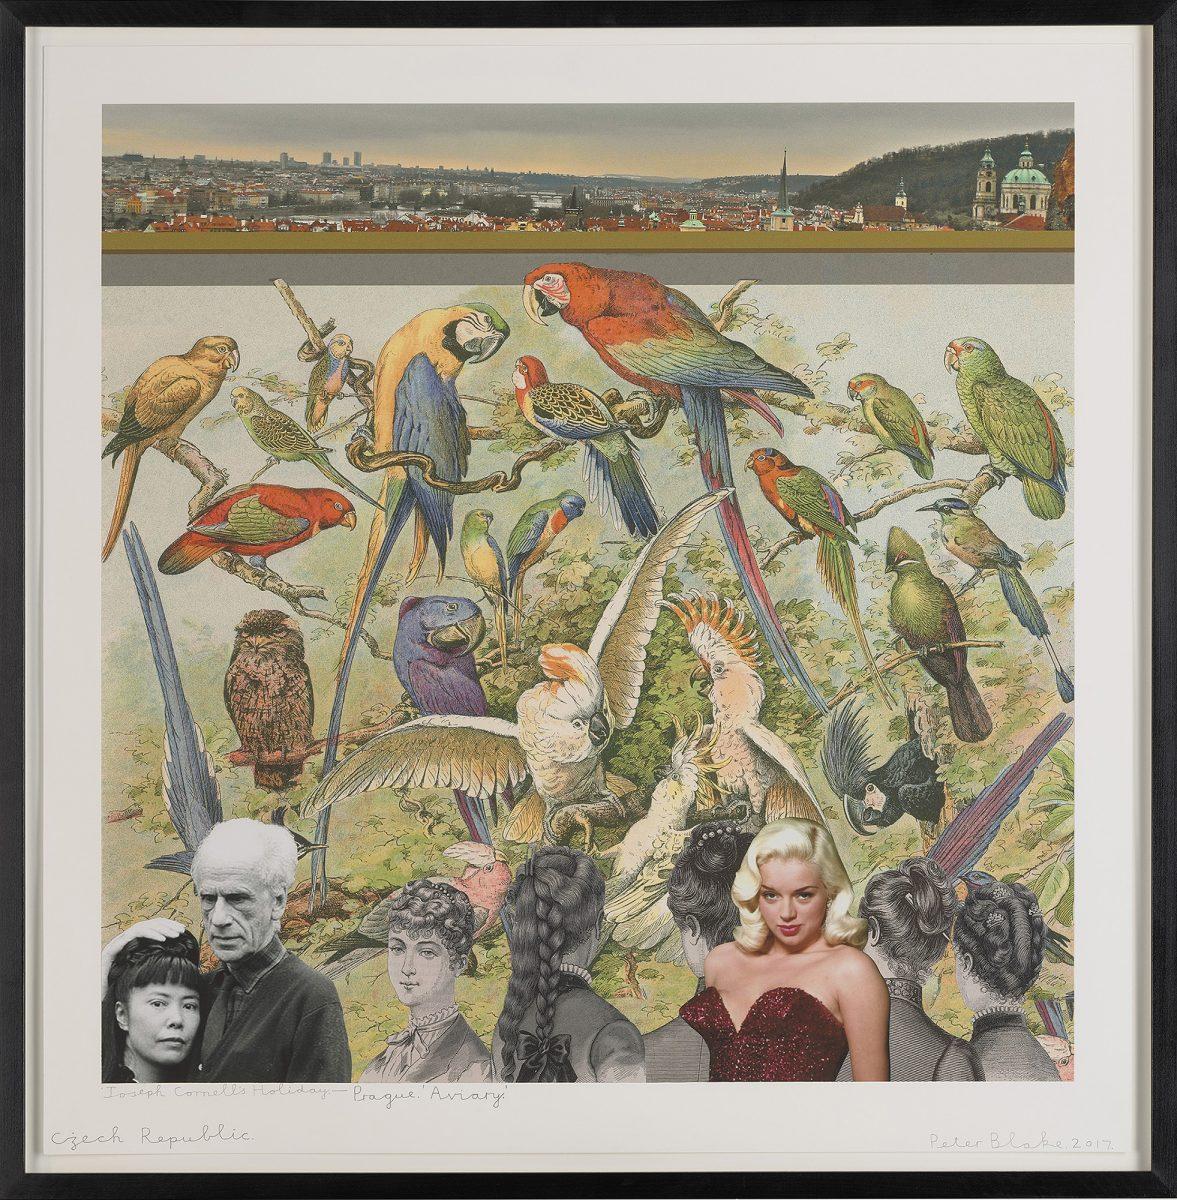 Joseph Cornell's Holiday—Czech Republic, Prague. 'Aviary', 2017